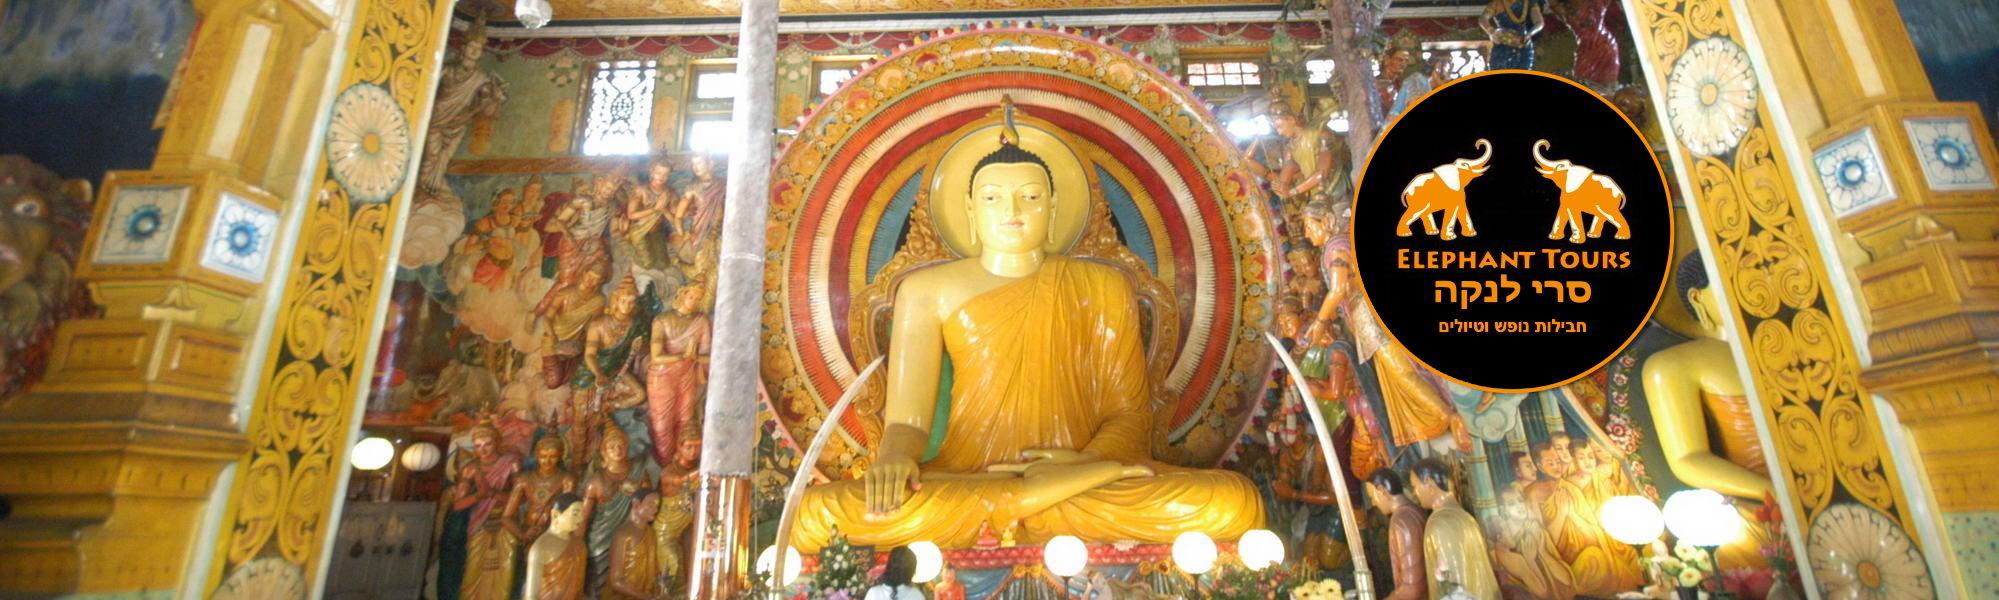 Sri-Lanka-Buddha-Statue-1